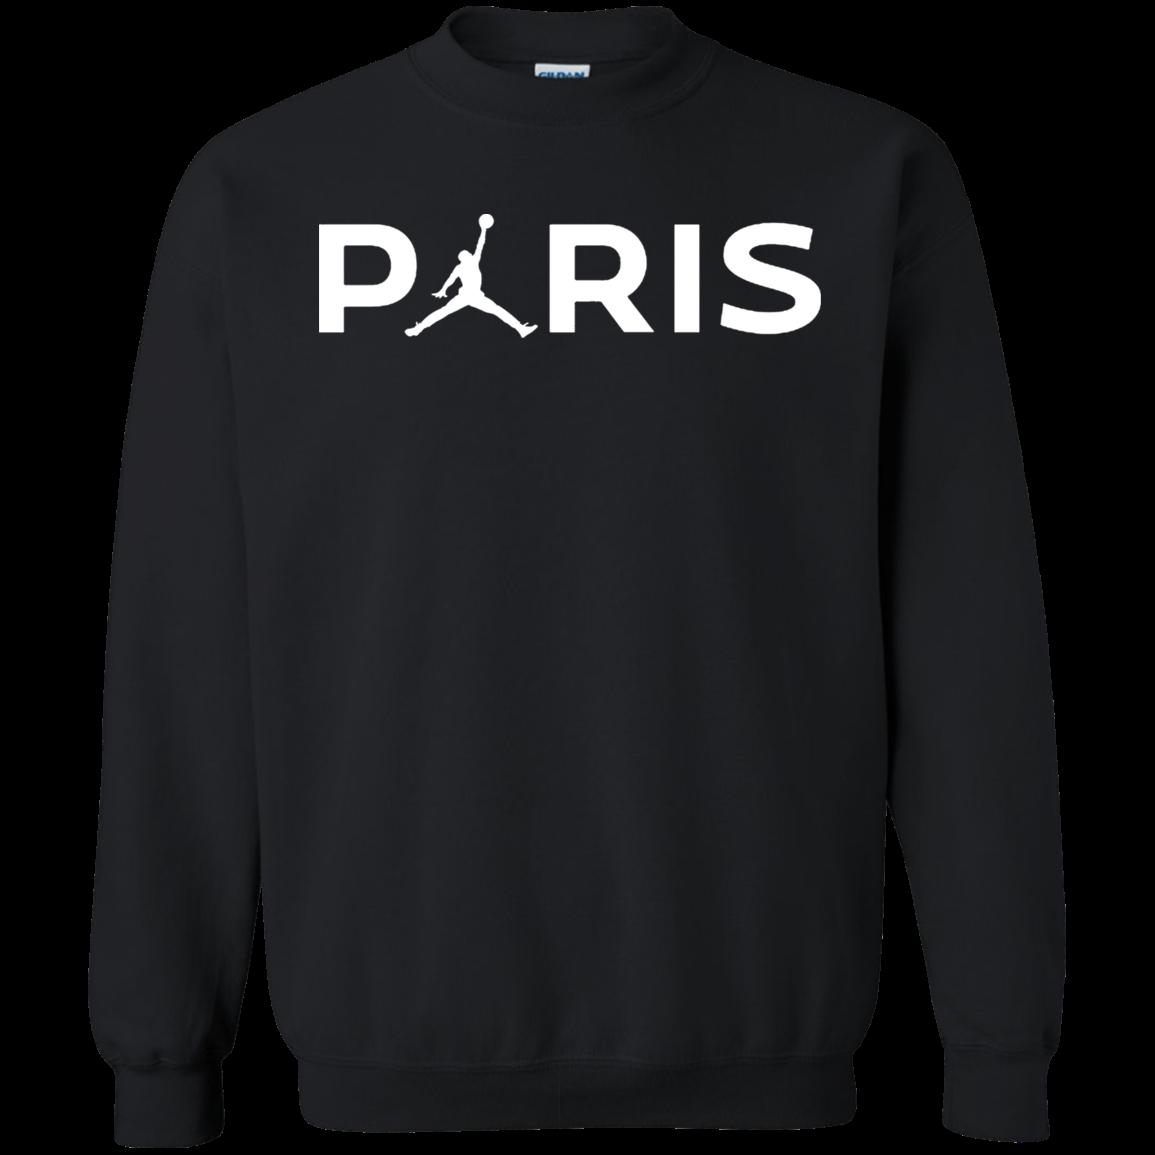 Psg Jordan Sweater Dark Black Shipping Worldwide Ninonine Polo Shirt Outfits Hoodie Outfit Men Sweatshirts